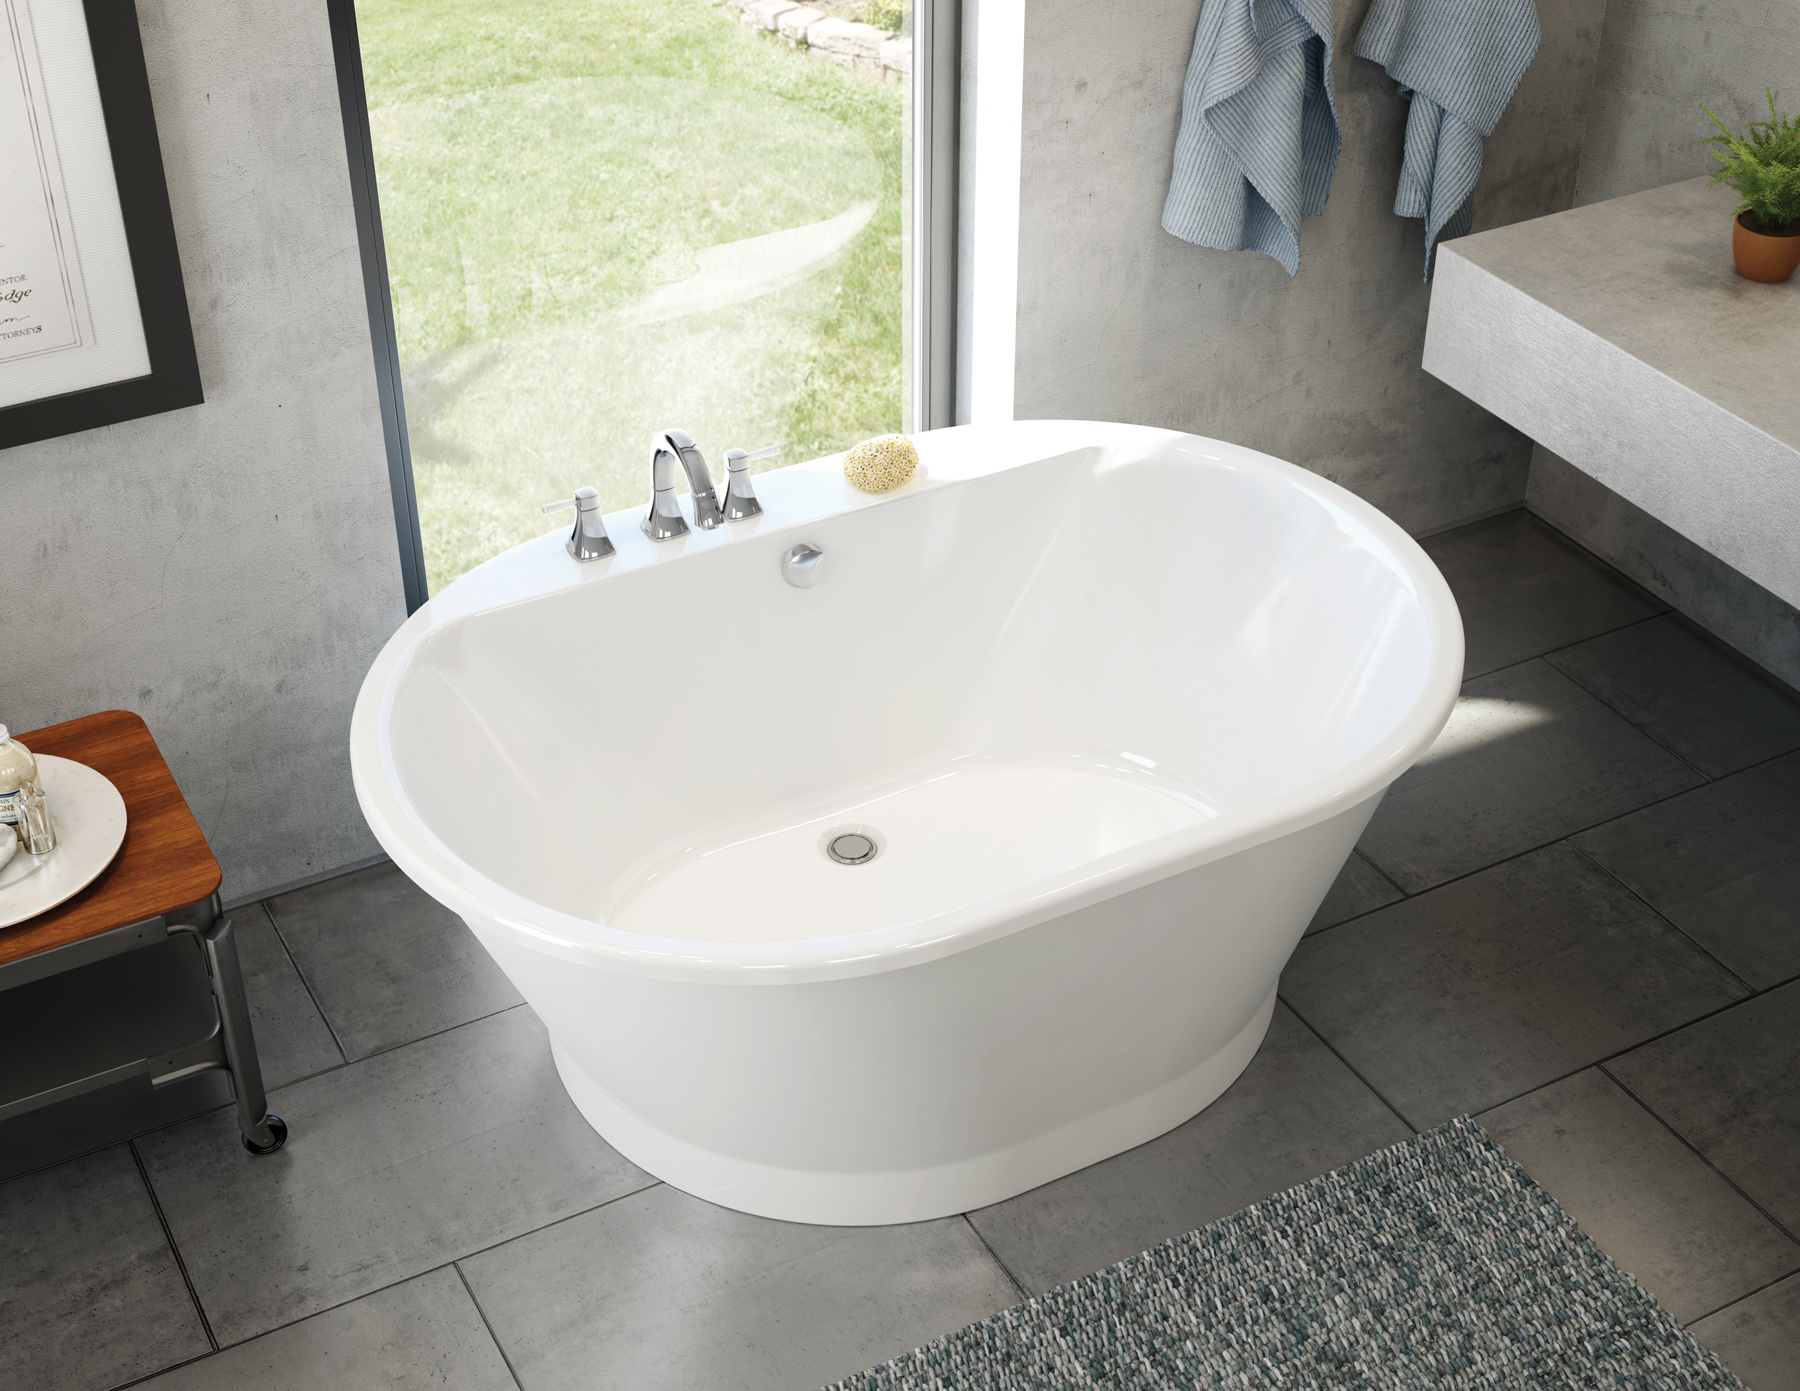 Maax professional introduces affordable brioso tub jlc for Affordable baths